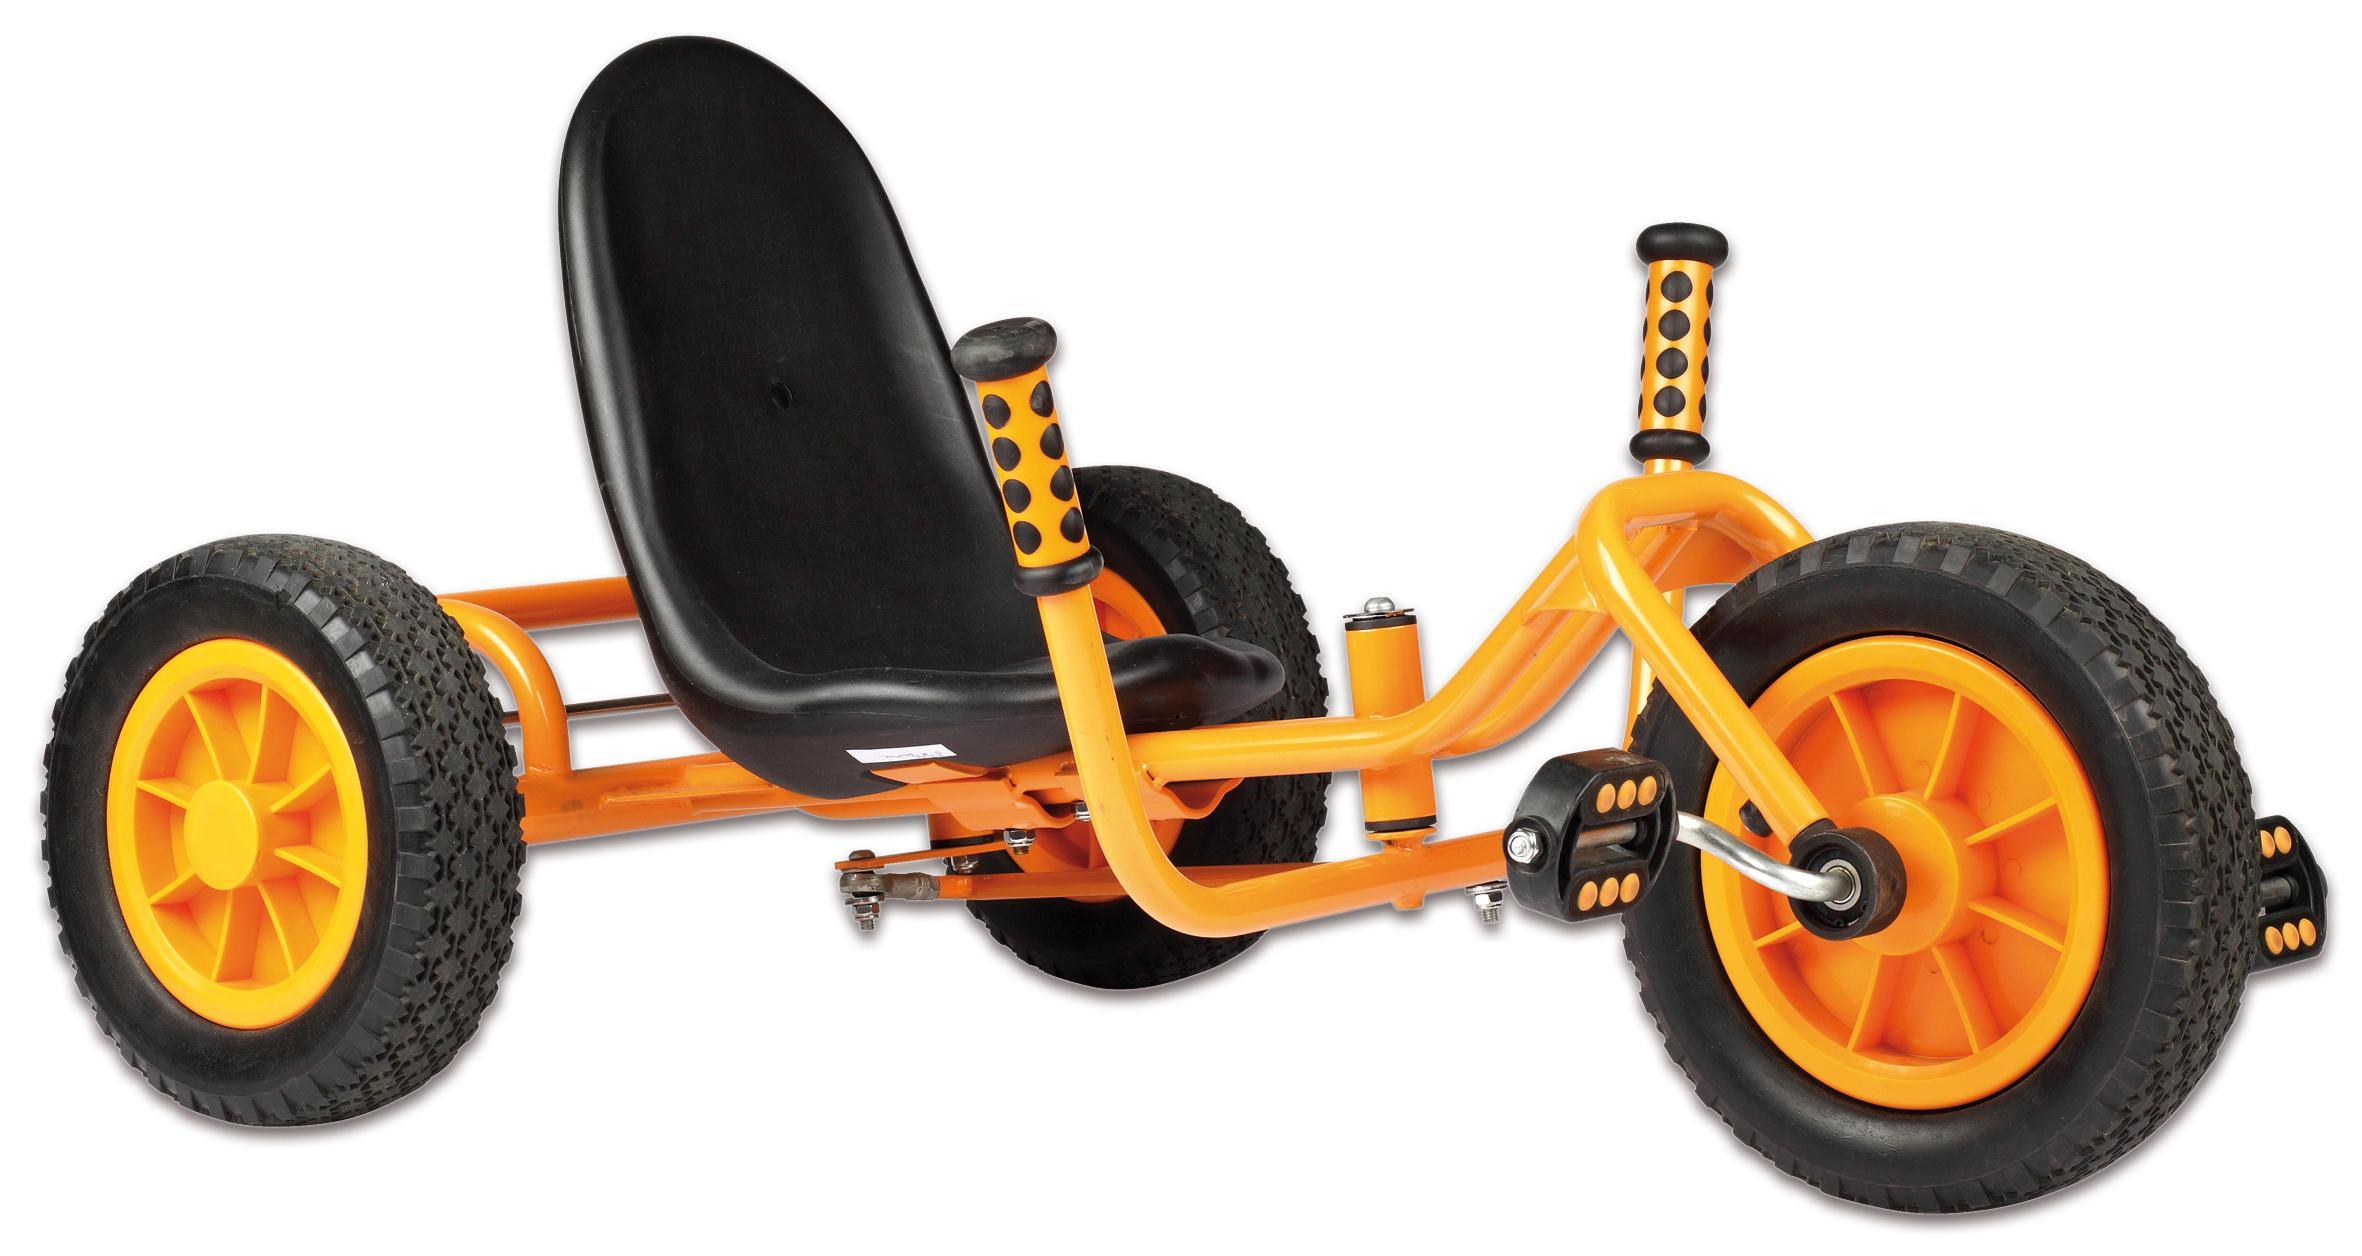 Trike Dreirad Tretfahrzeug Kinder Fahrzeug 4-8 Jahren Sitzhöhe 19 cm ...